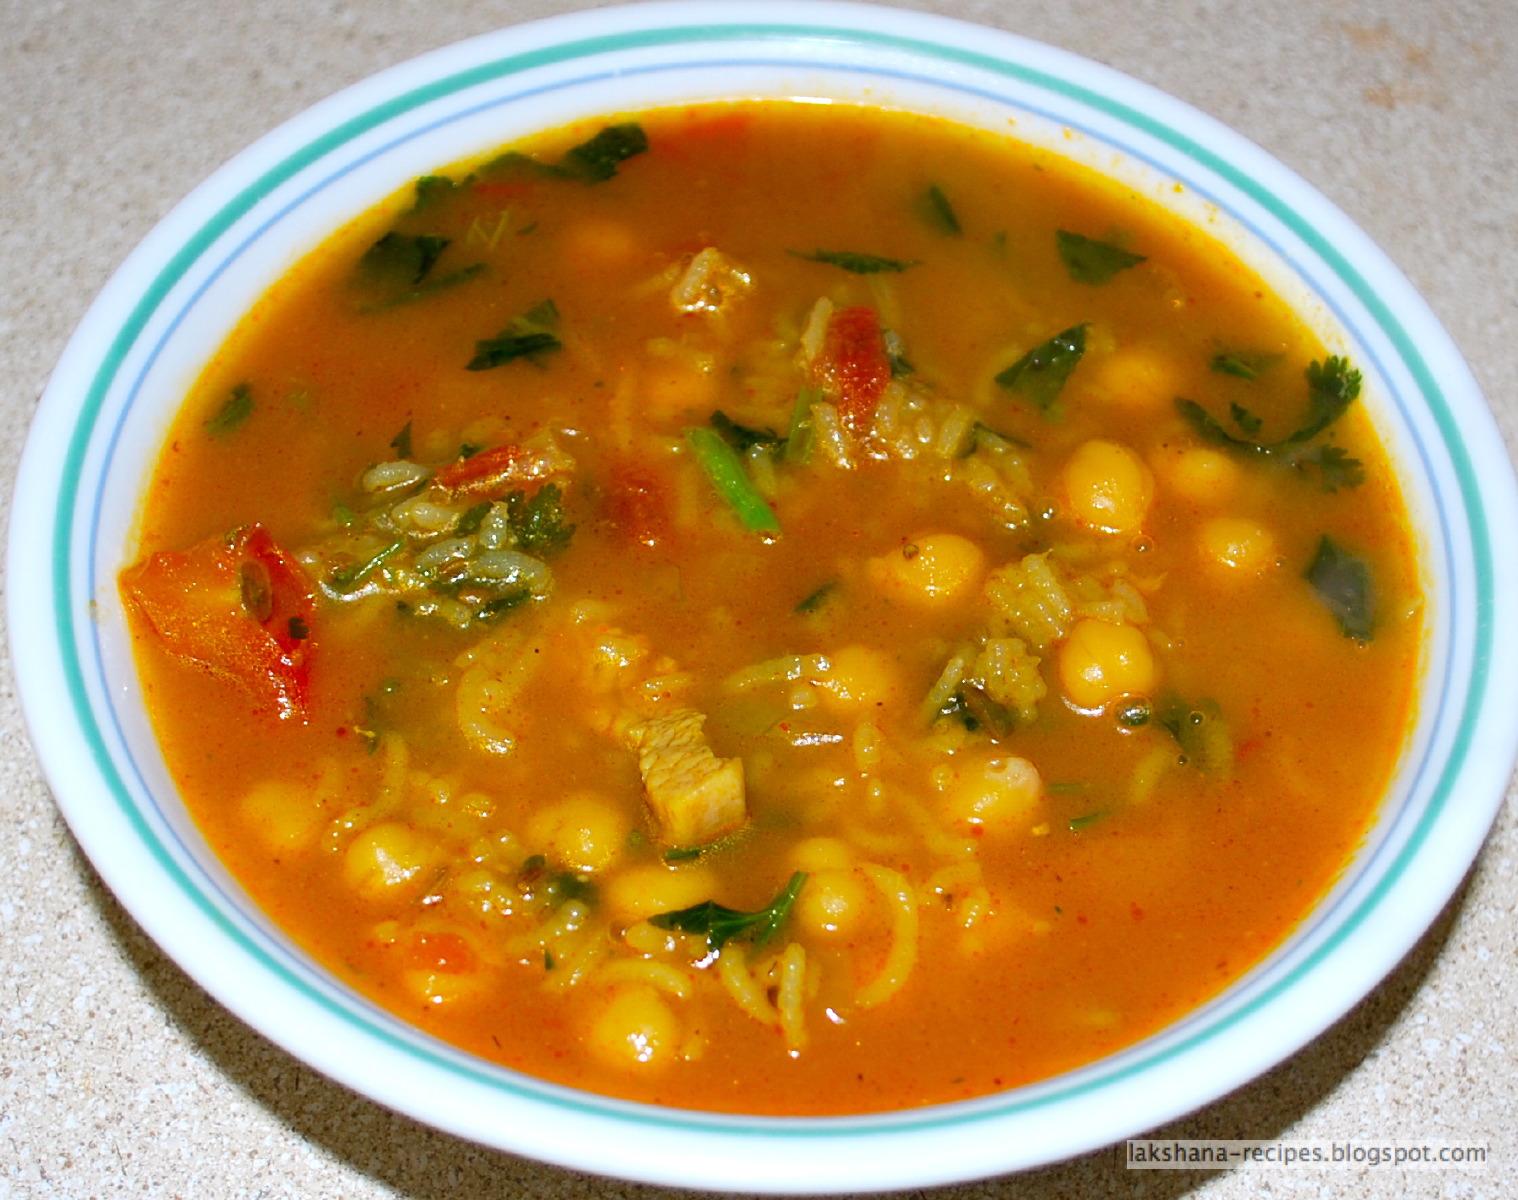 Lakshana recipes chicken soup similar to moroccan soup chicken soup similar to moroccan soup forumfinder Gallery